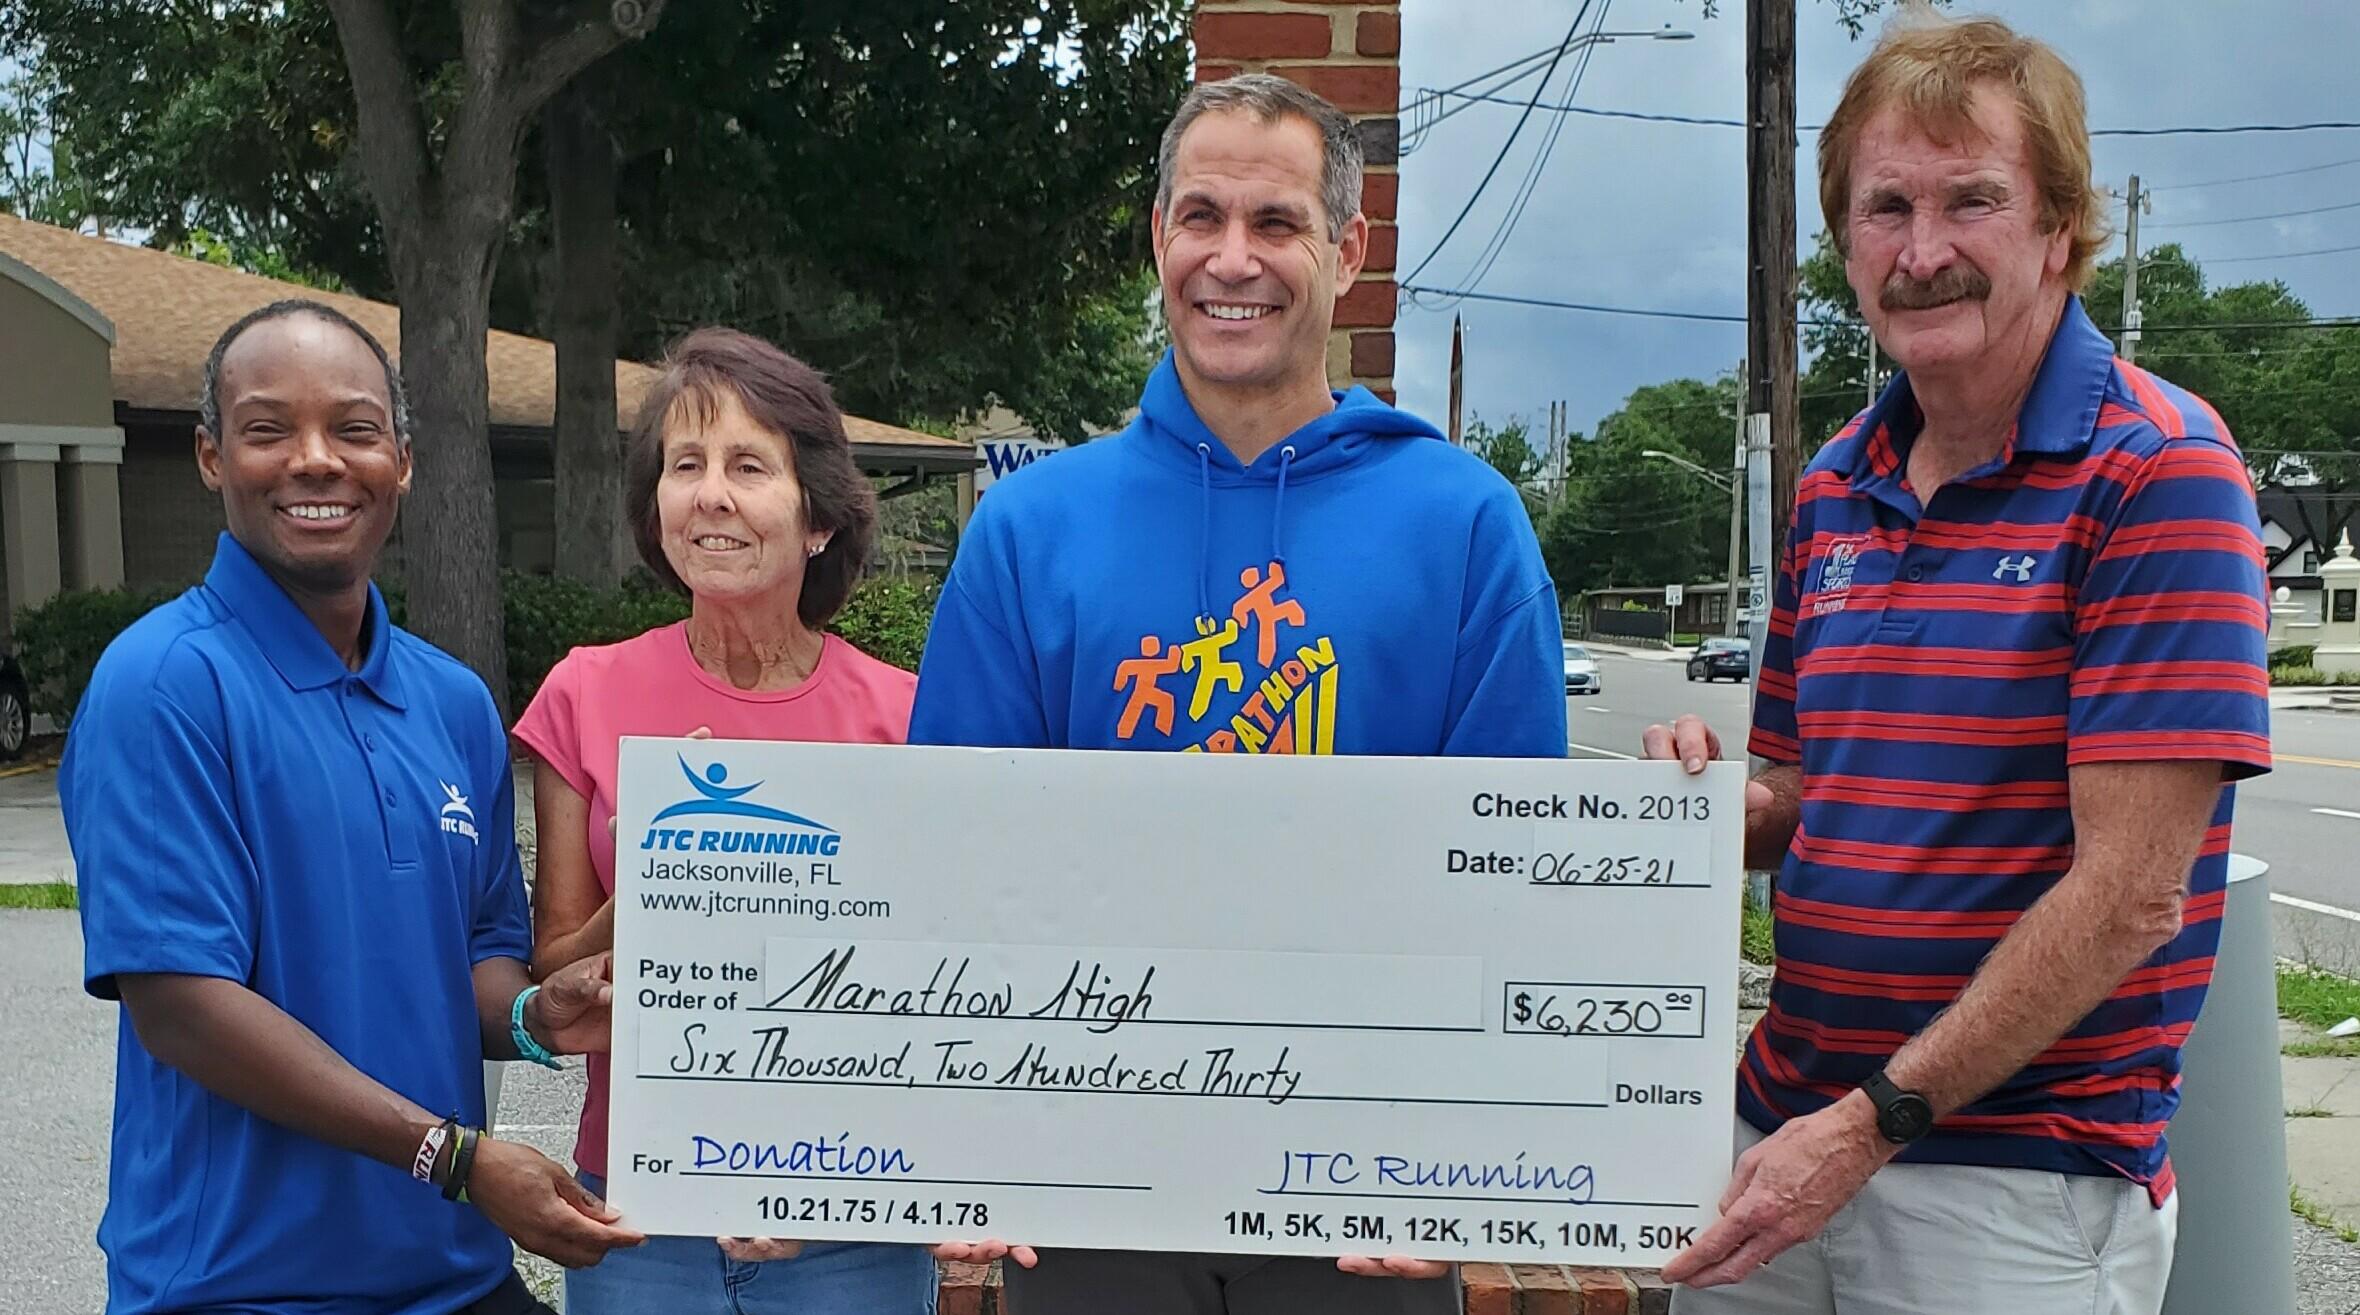 JTC Running Gives Marathon High $6230